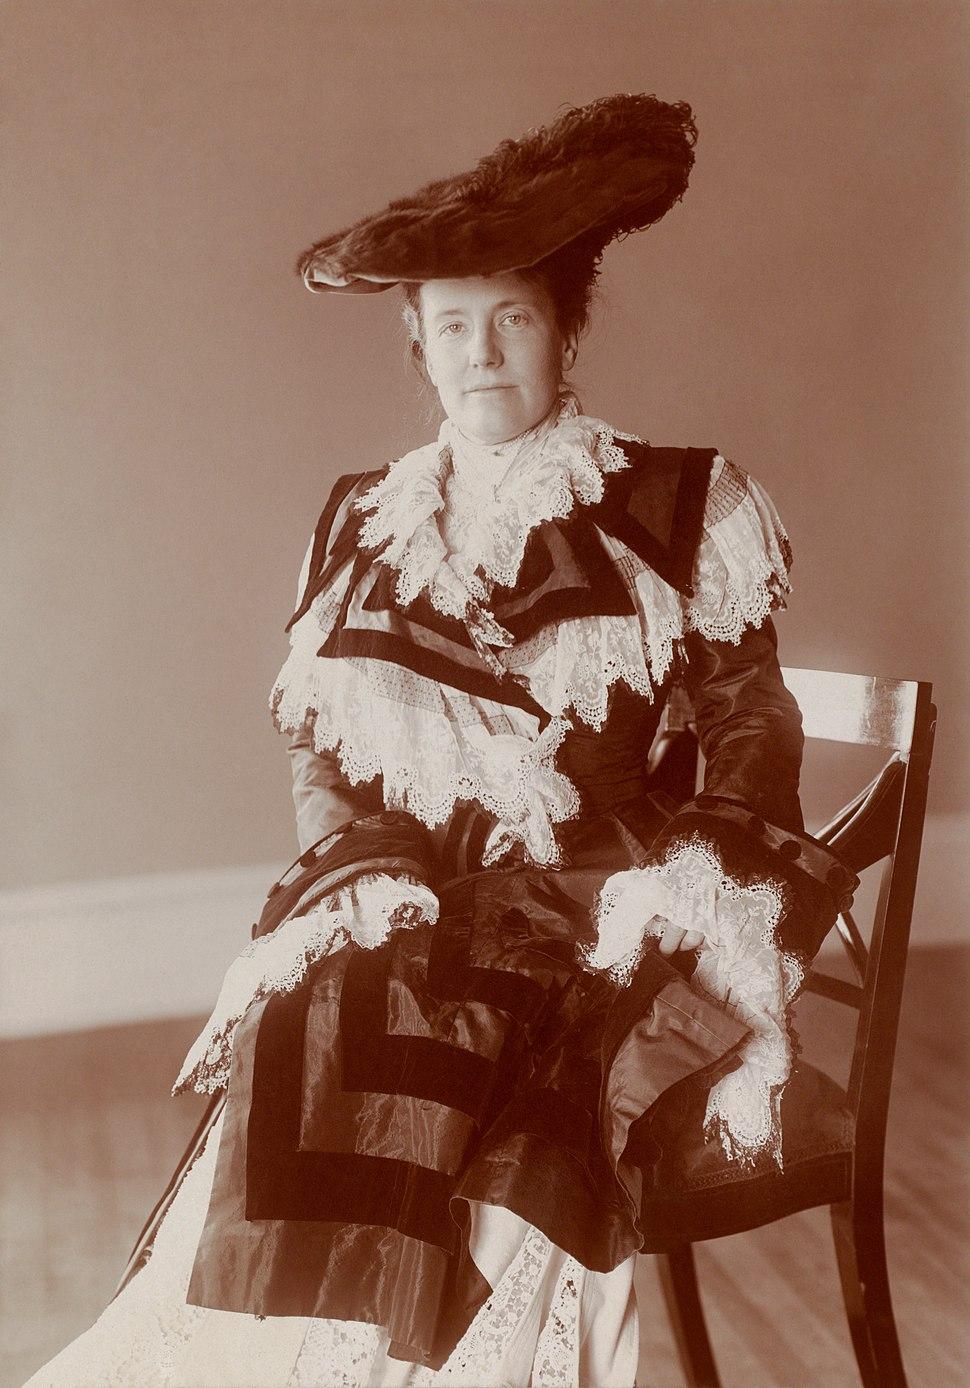 Edith Kermit Carow Roosevelt by Frances Benjamin Johnston